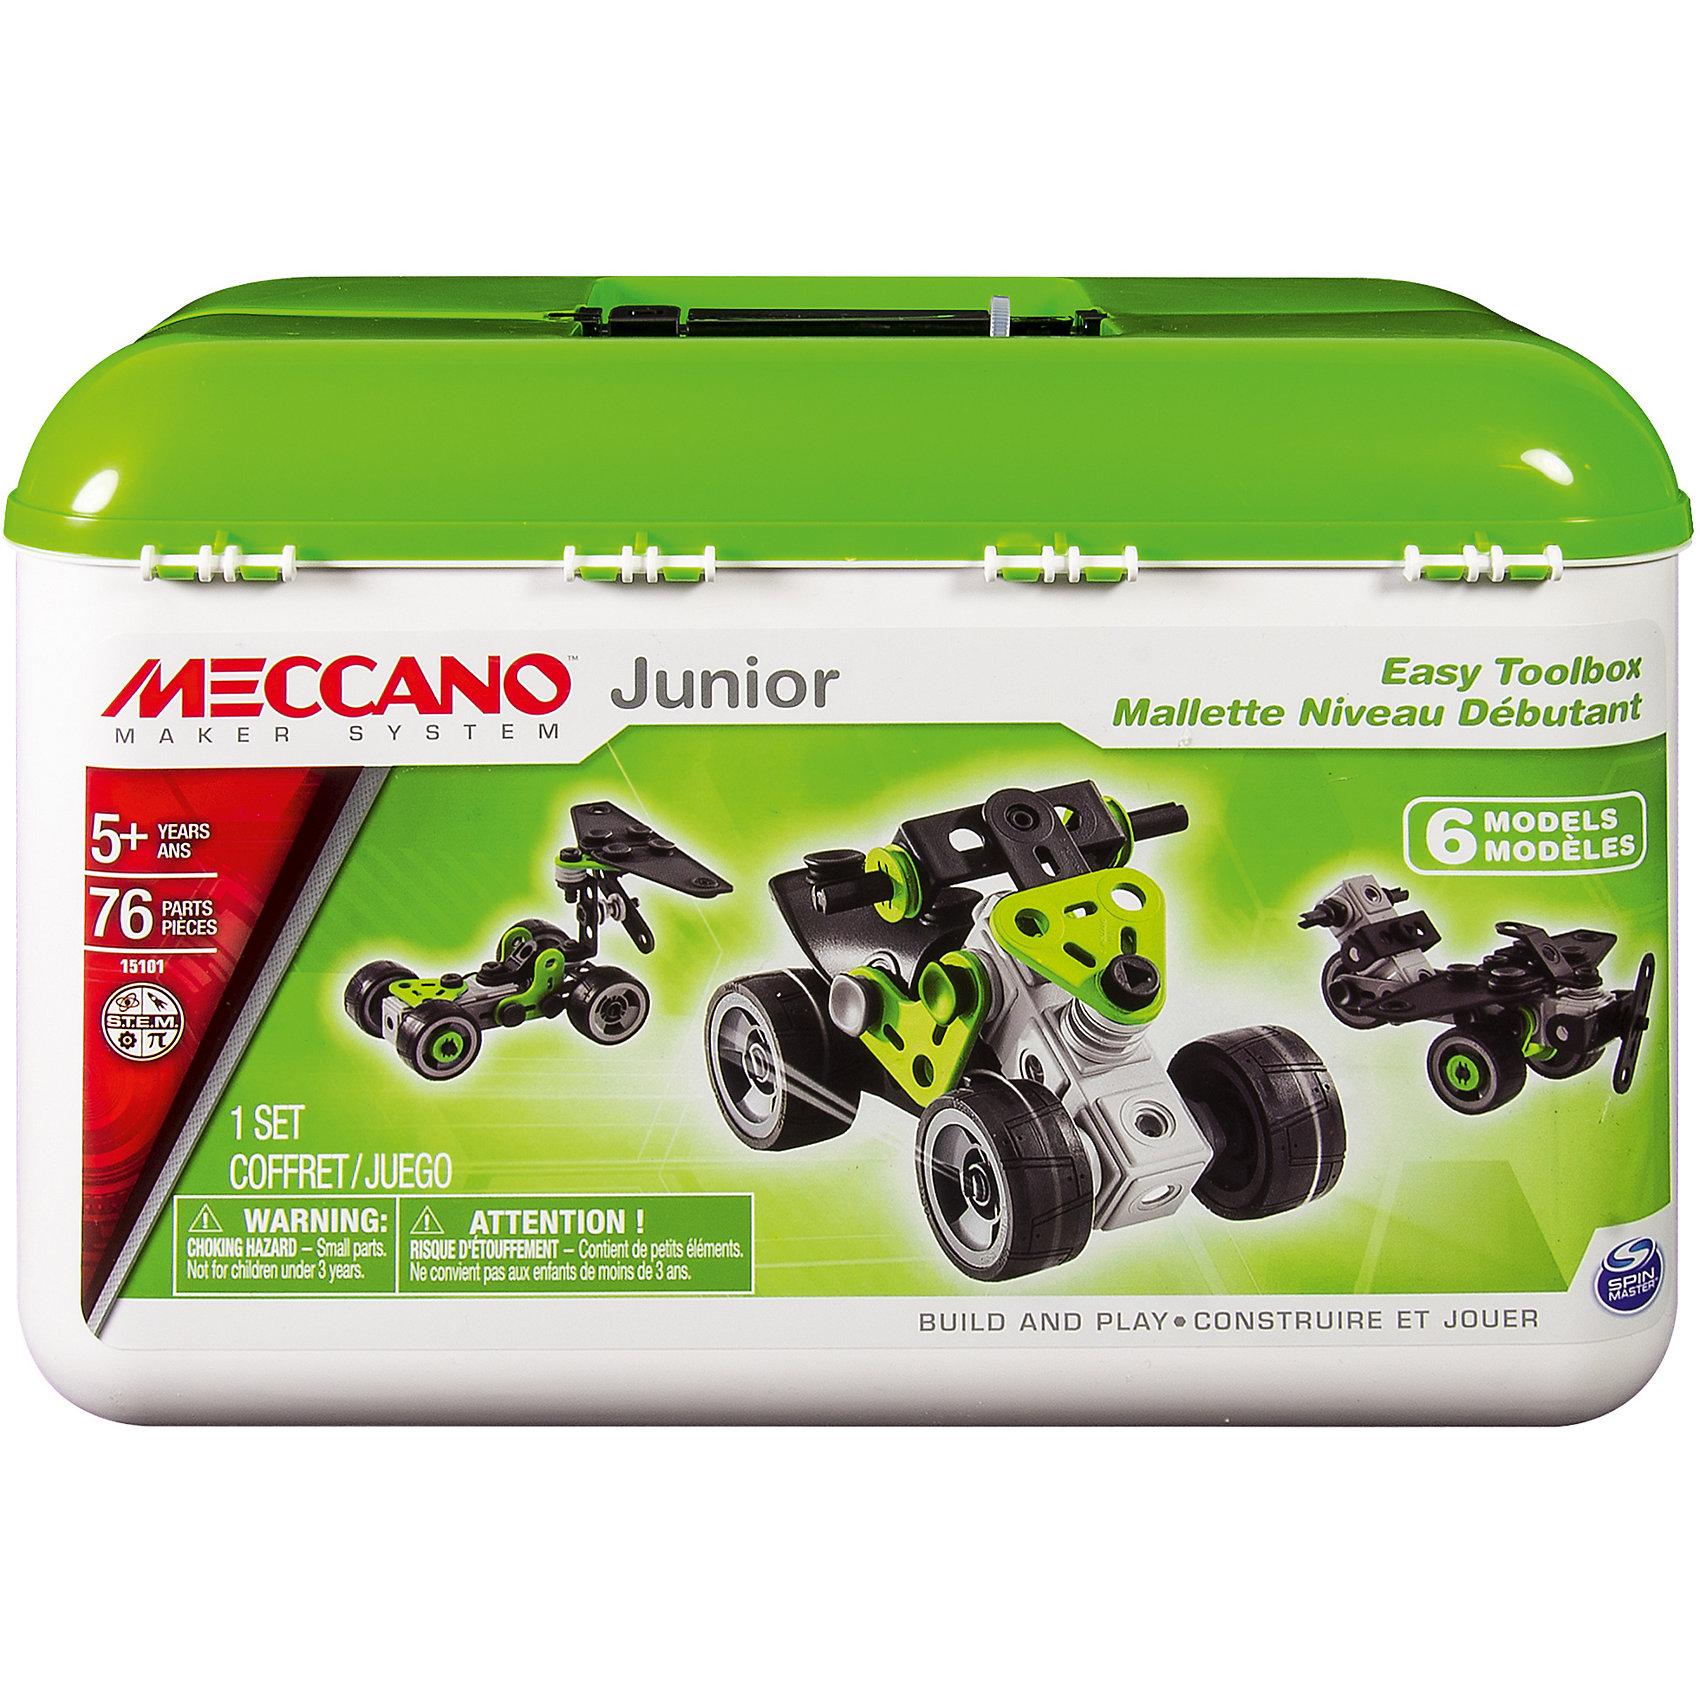 Meccano Квадроцикл (4 модели), Meccano игрушка meccano боевой вертолёт 2 модели meccano